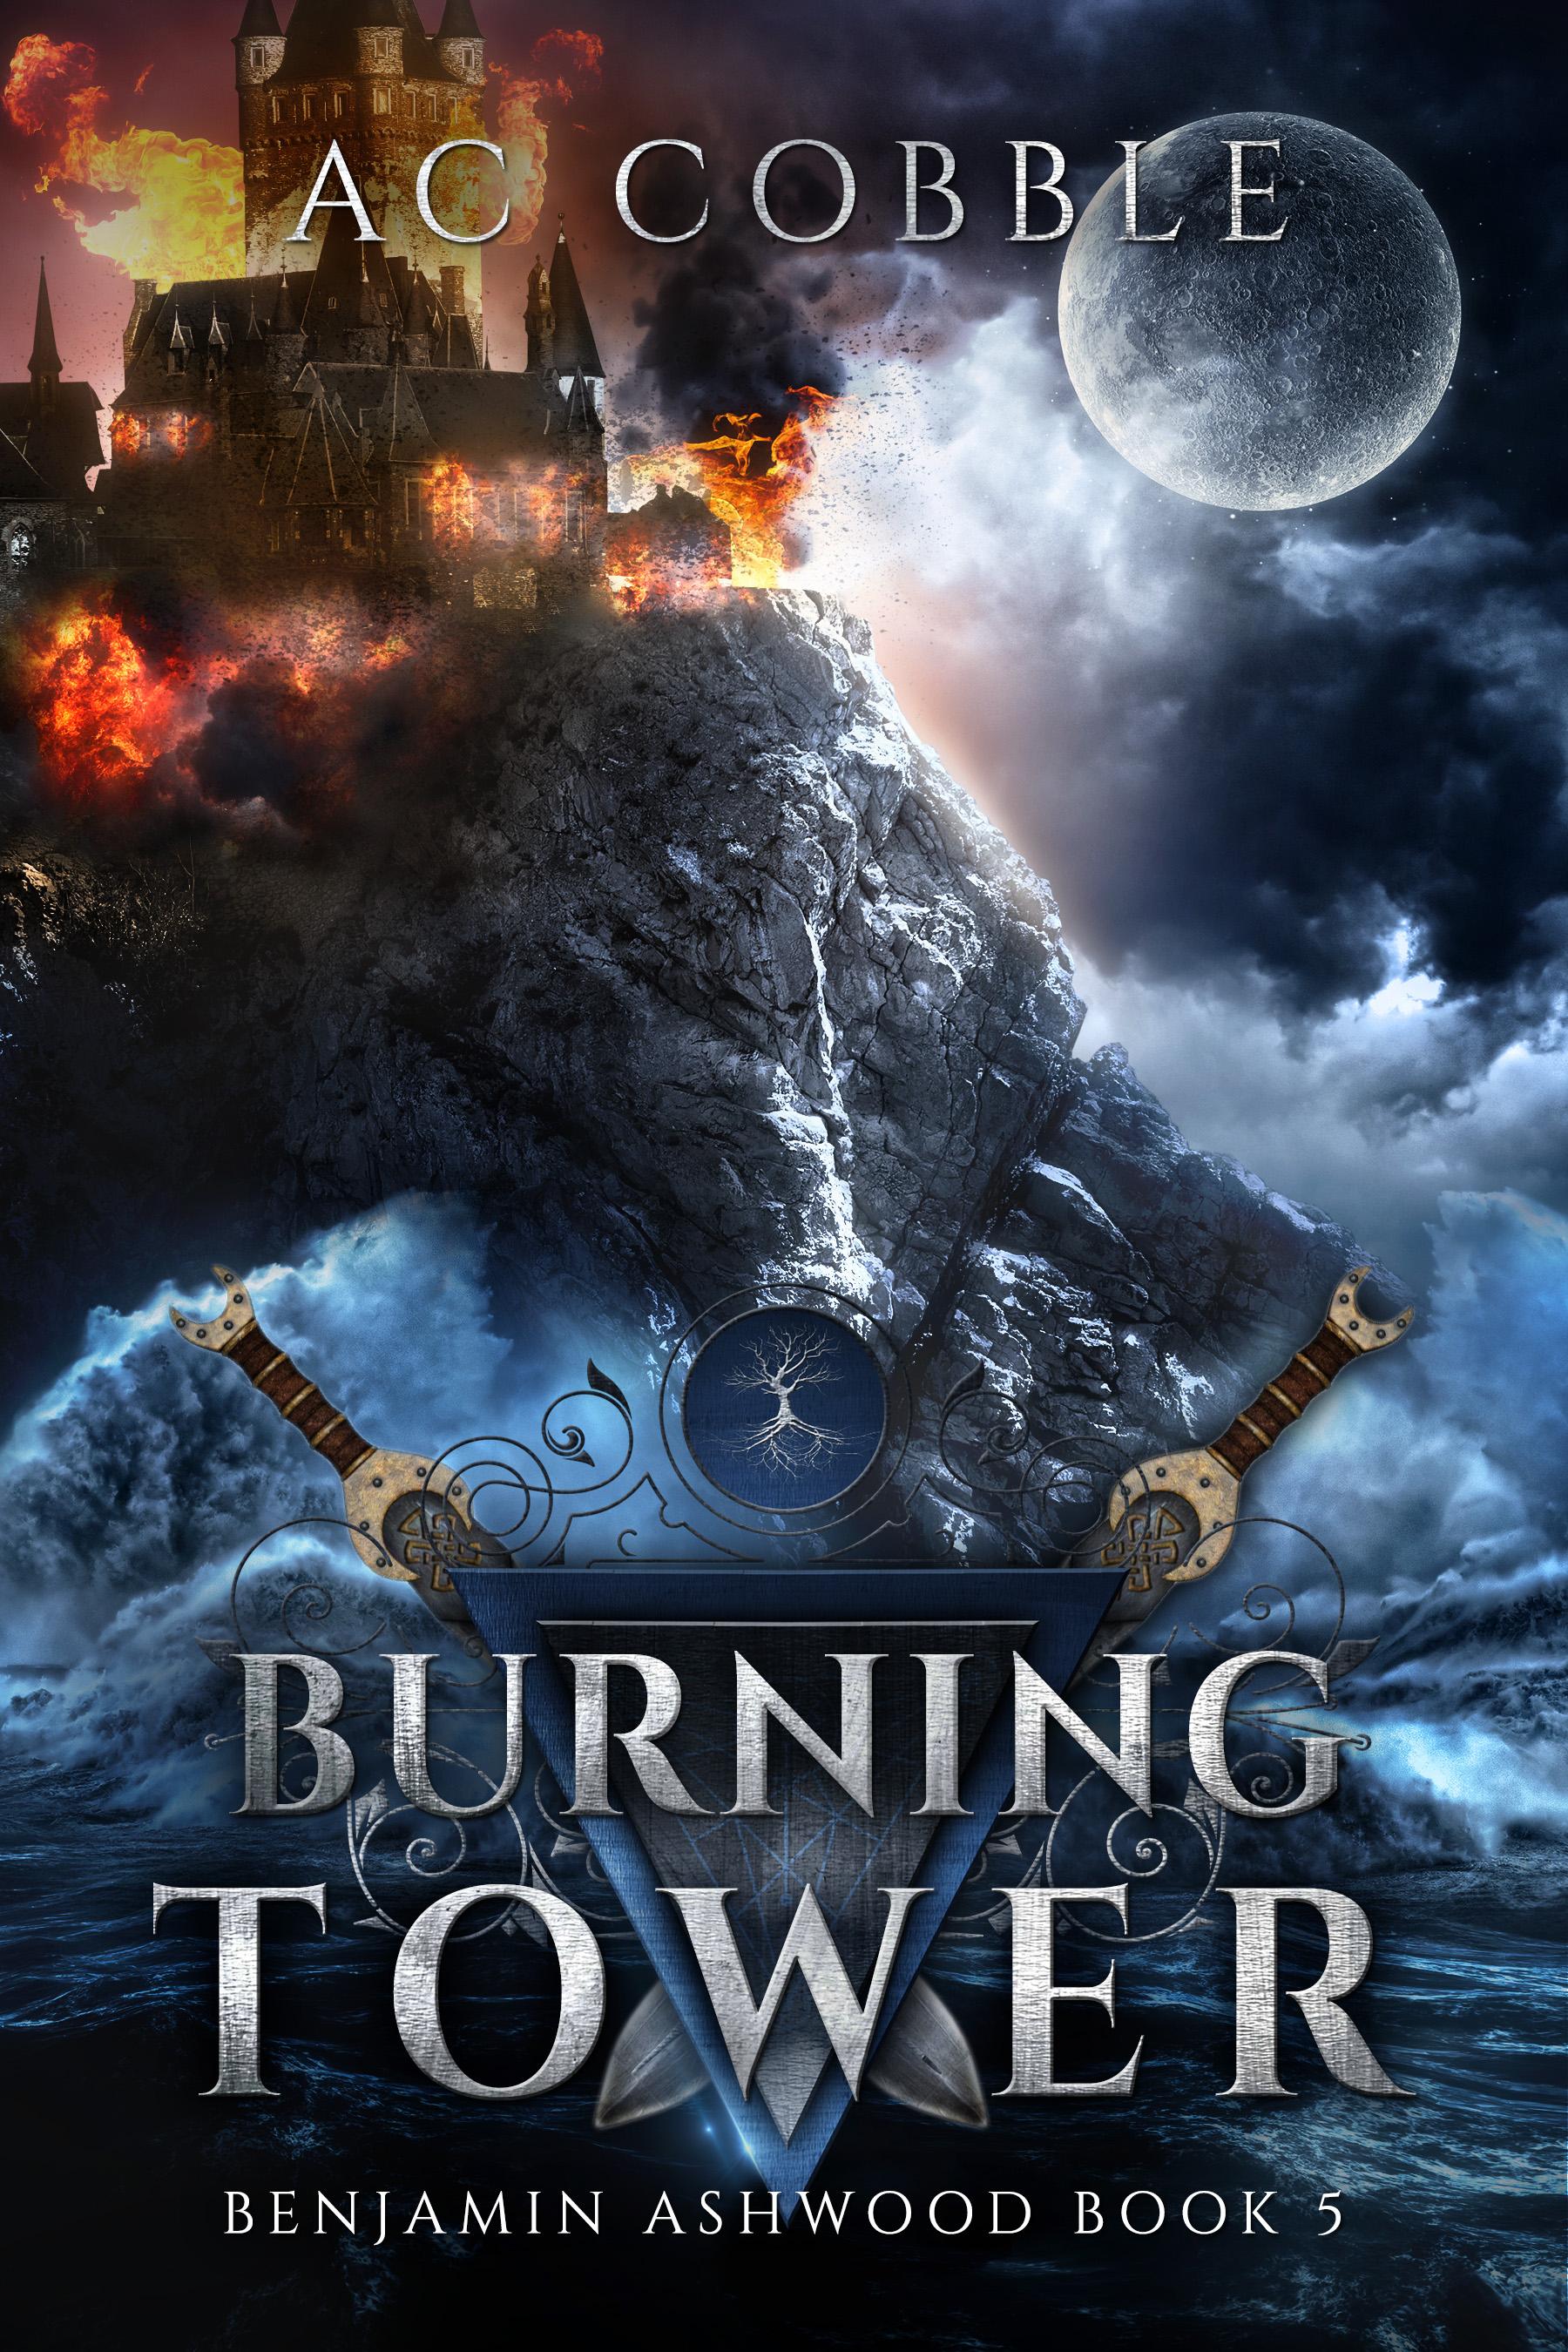 Burning Tower - Benjamin Ashwood Book 5.jpg